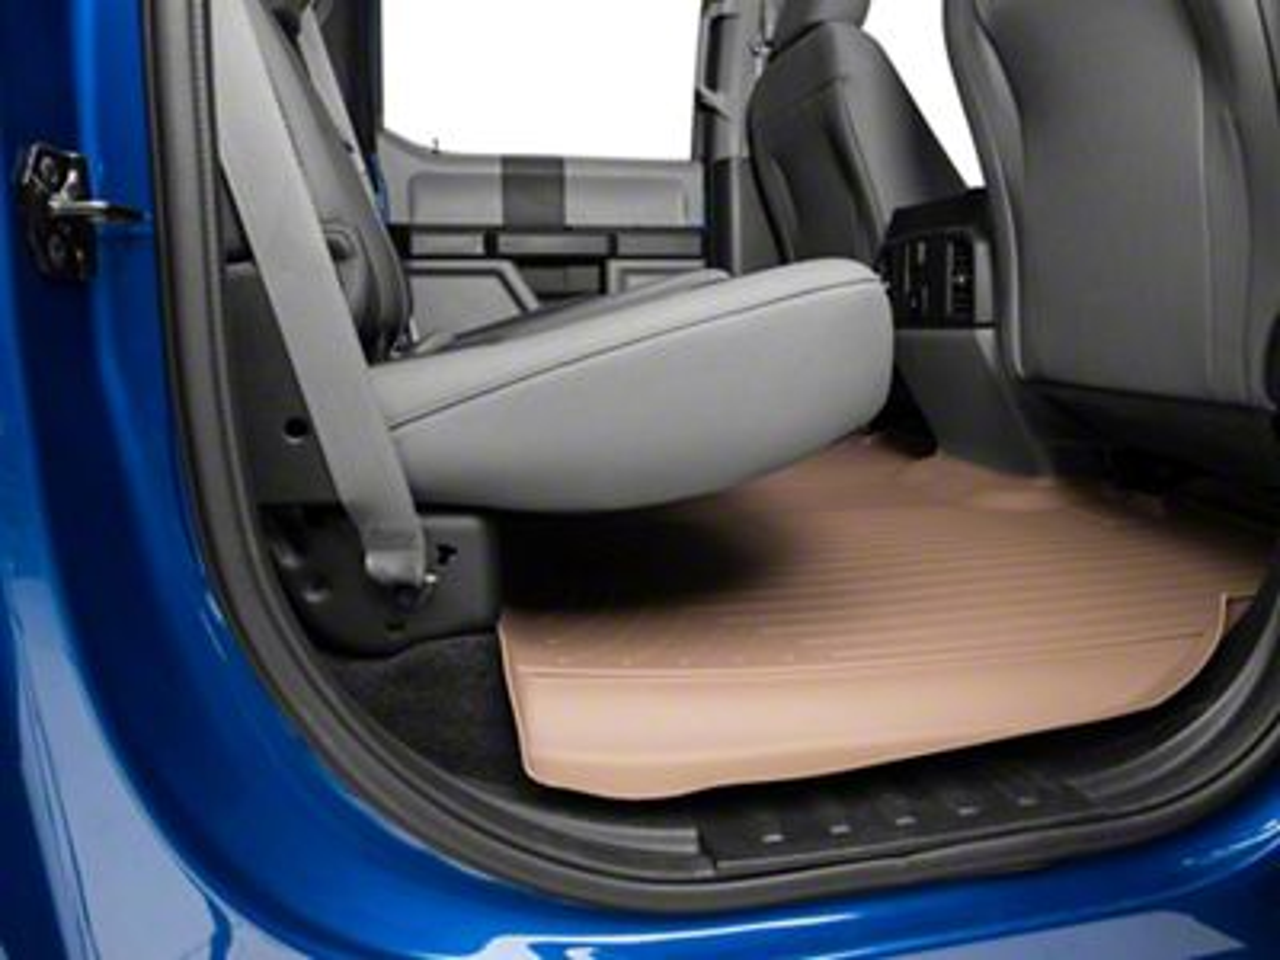 Weathertech DigitalFit Rear Floor Mat - Tan (15-19 F-150 SuperCrew w/ 1st row bucket seats)